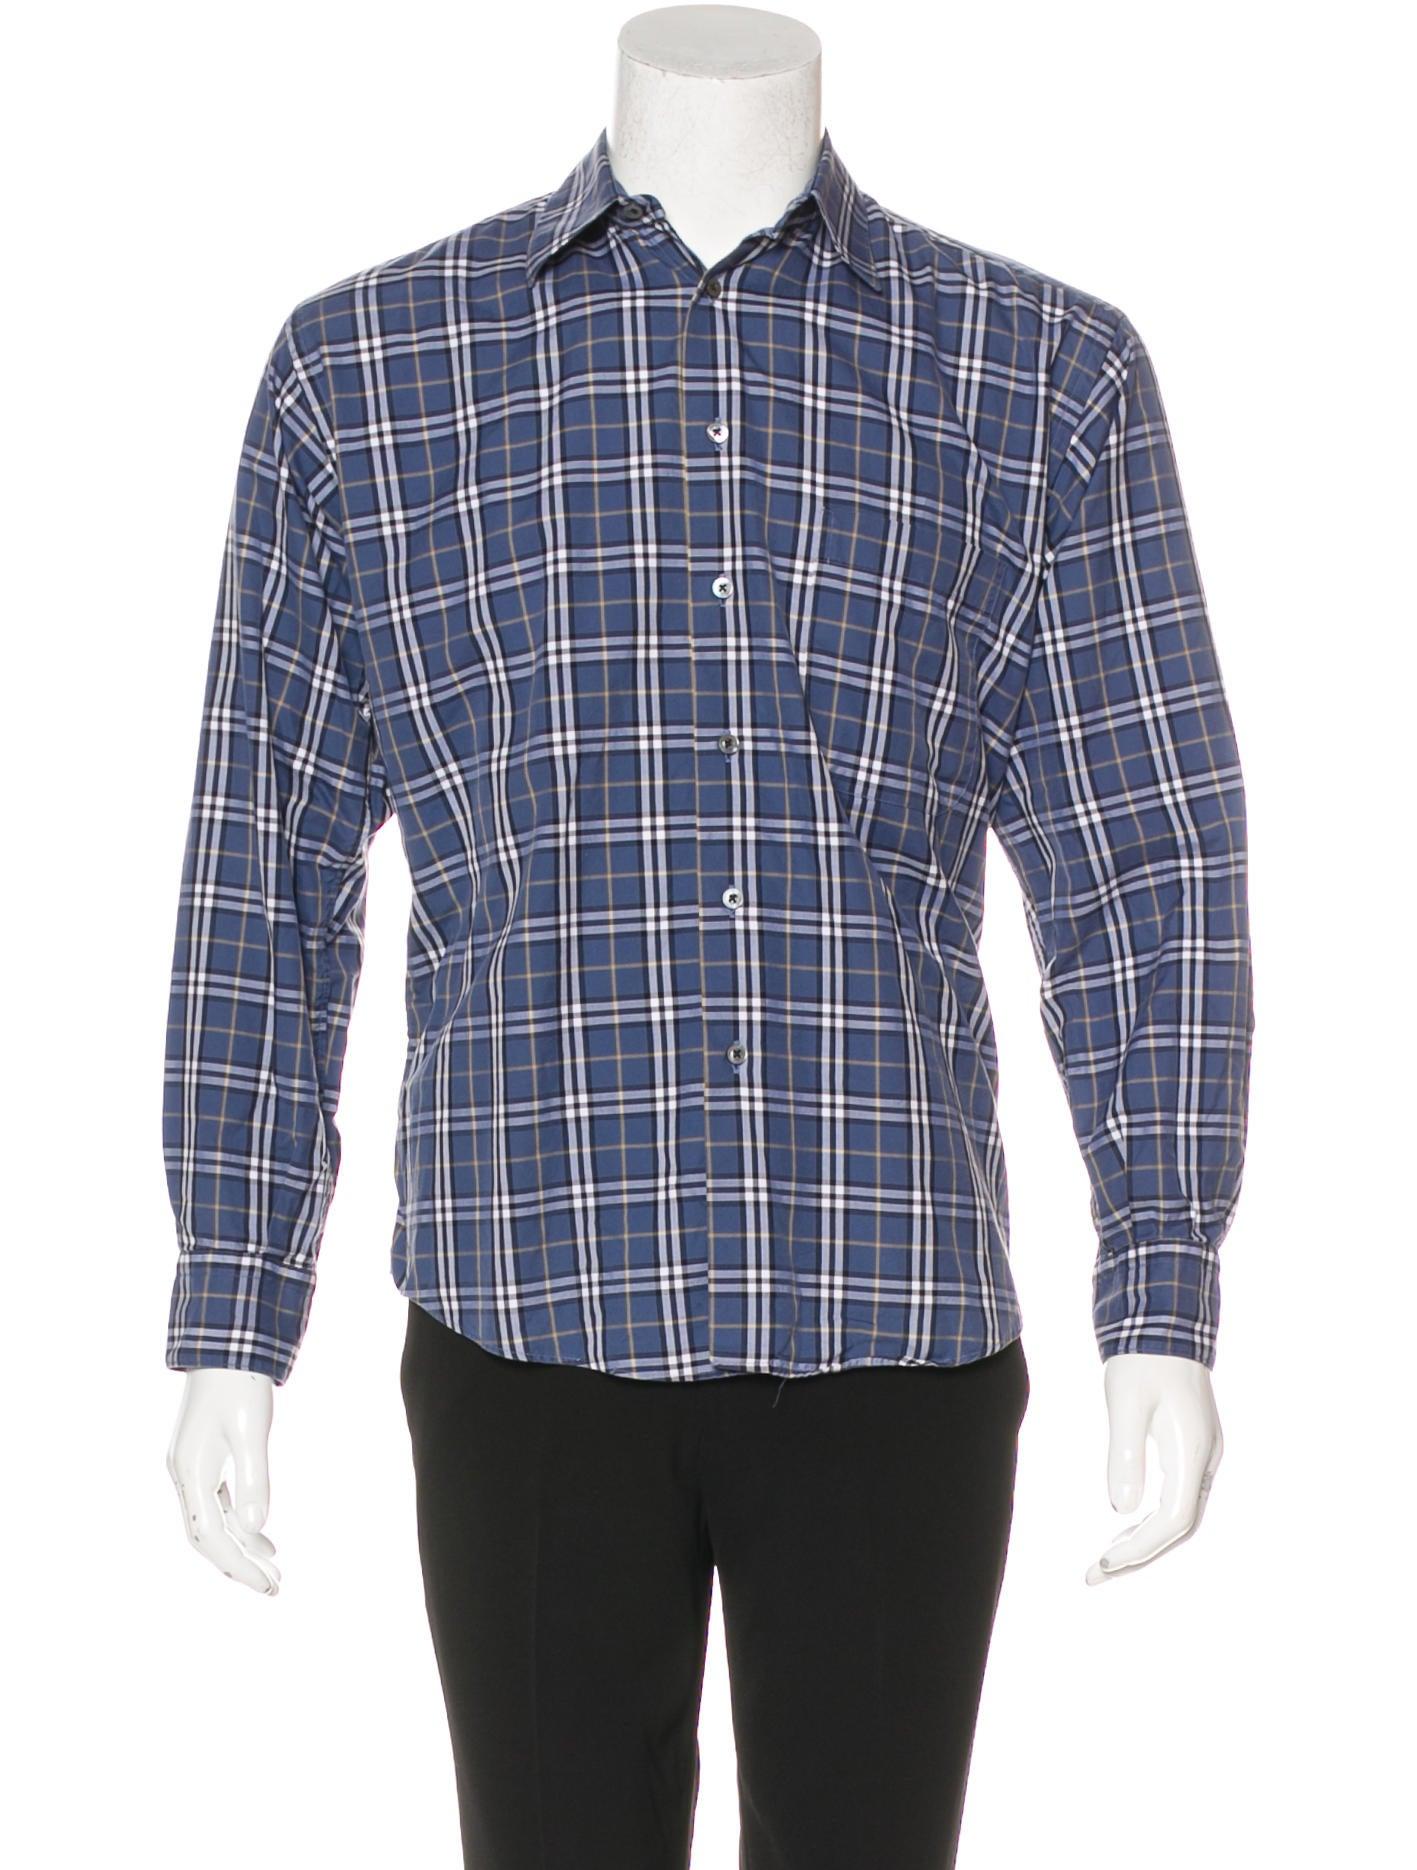 Burberry London Nova Check Shirt Clothing Wburl27657